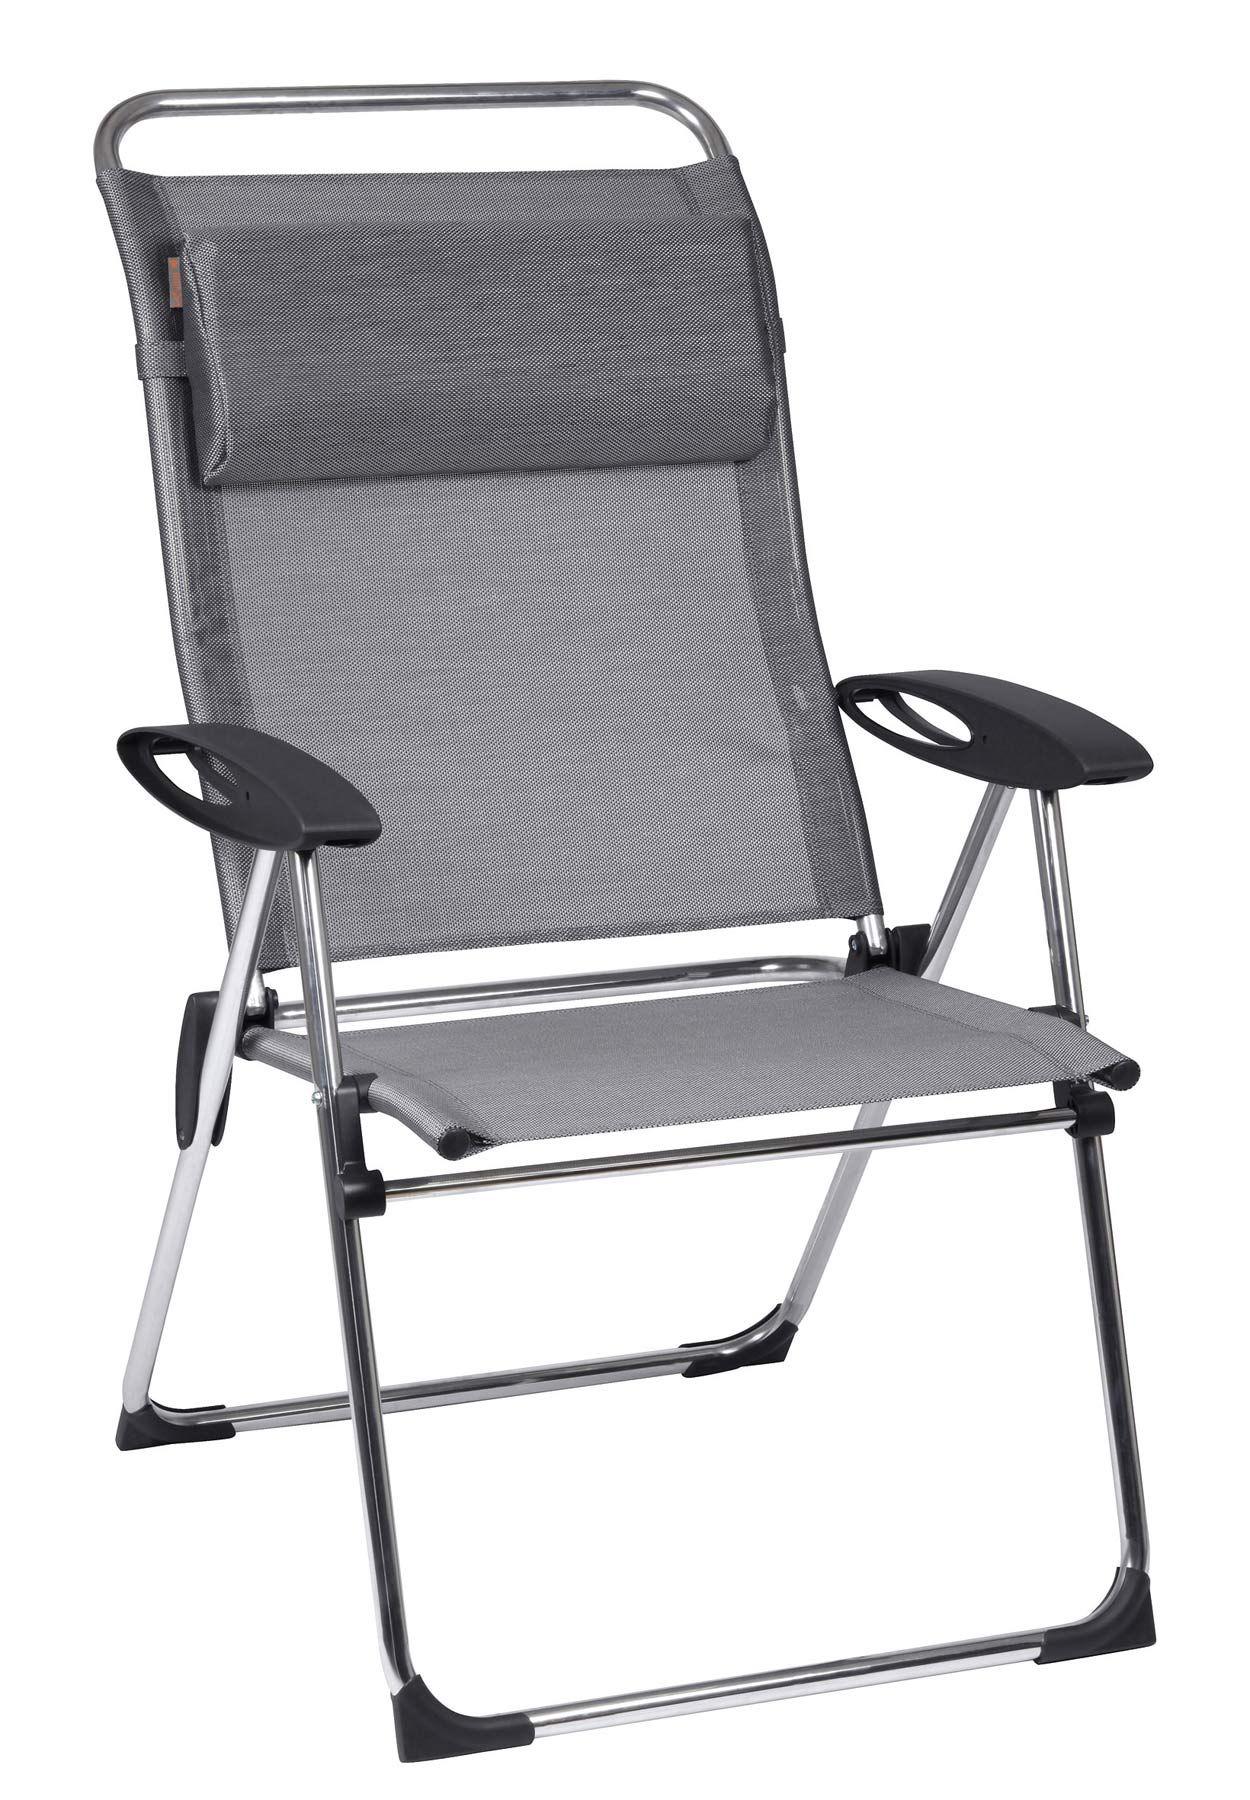 Marvelous Beachmall.com   Lafuma Chamonix Elips XL / High Back Chair